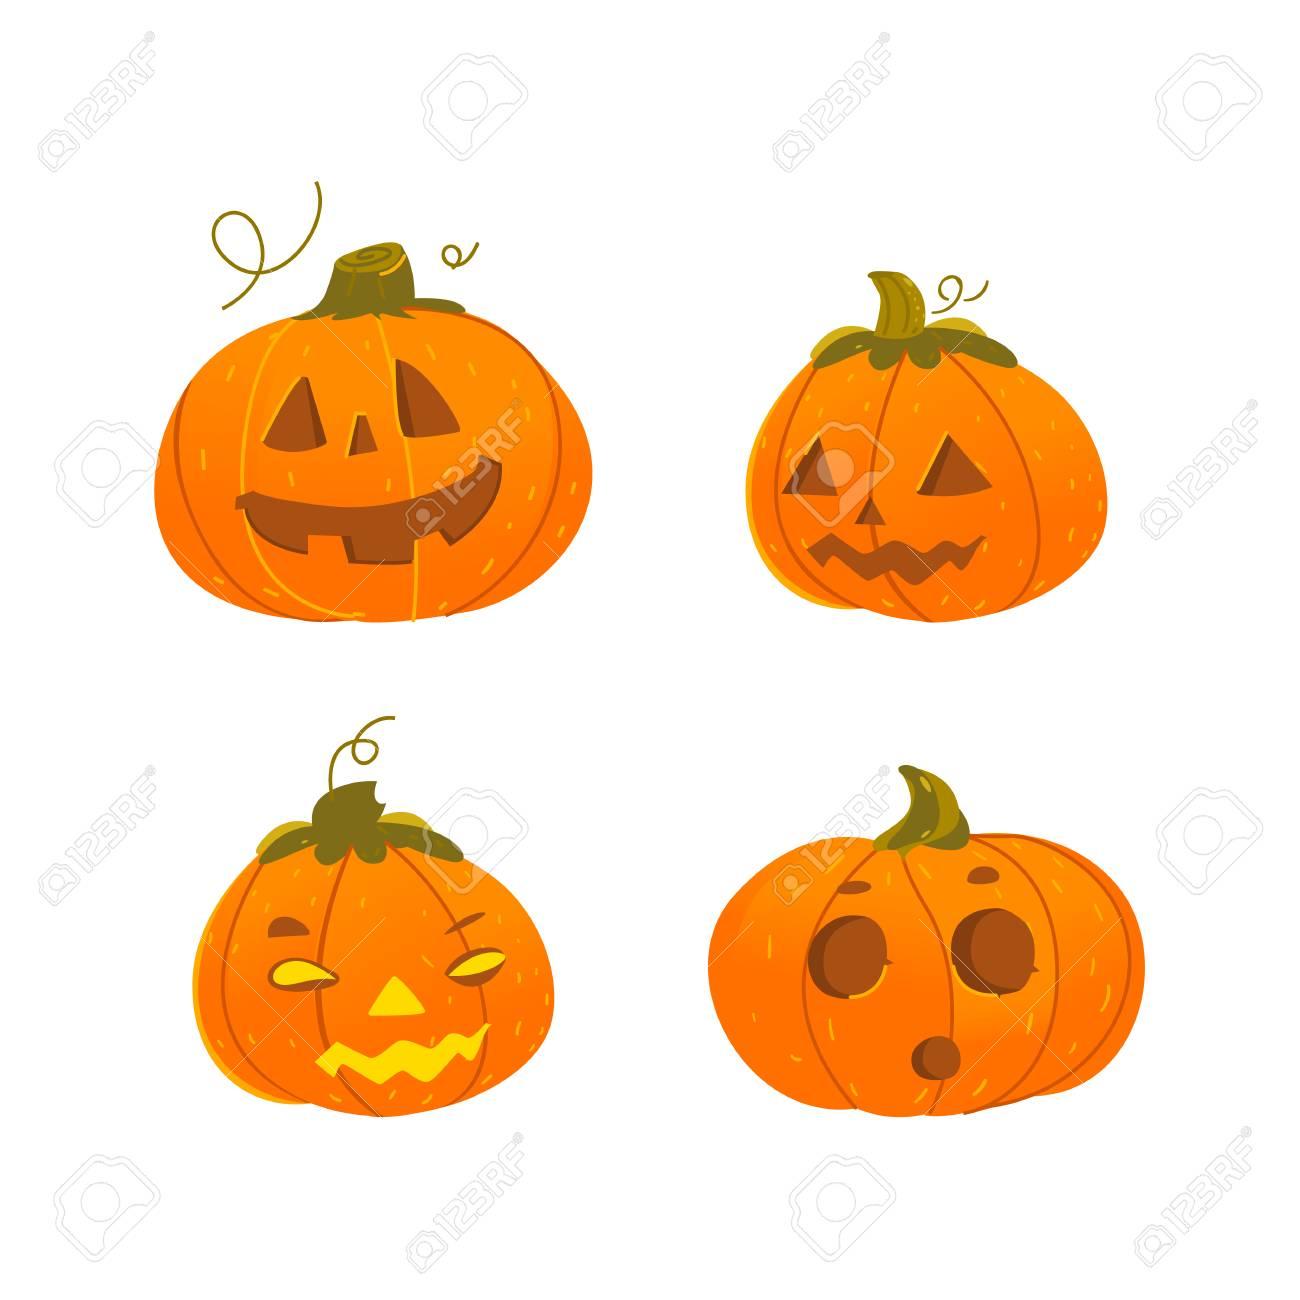 Set Of Cute Funny Halloween Pumpkin Jack O Lanterns Smiling Royalty Free Cliparts Vectors And Stock Illustration Image 84861845